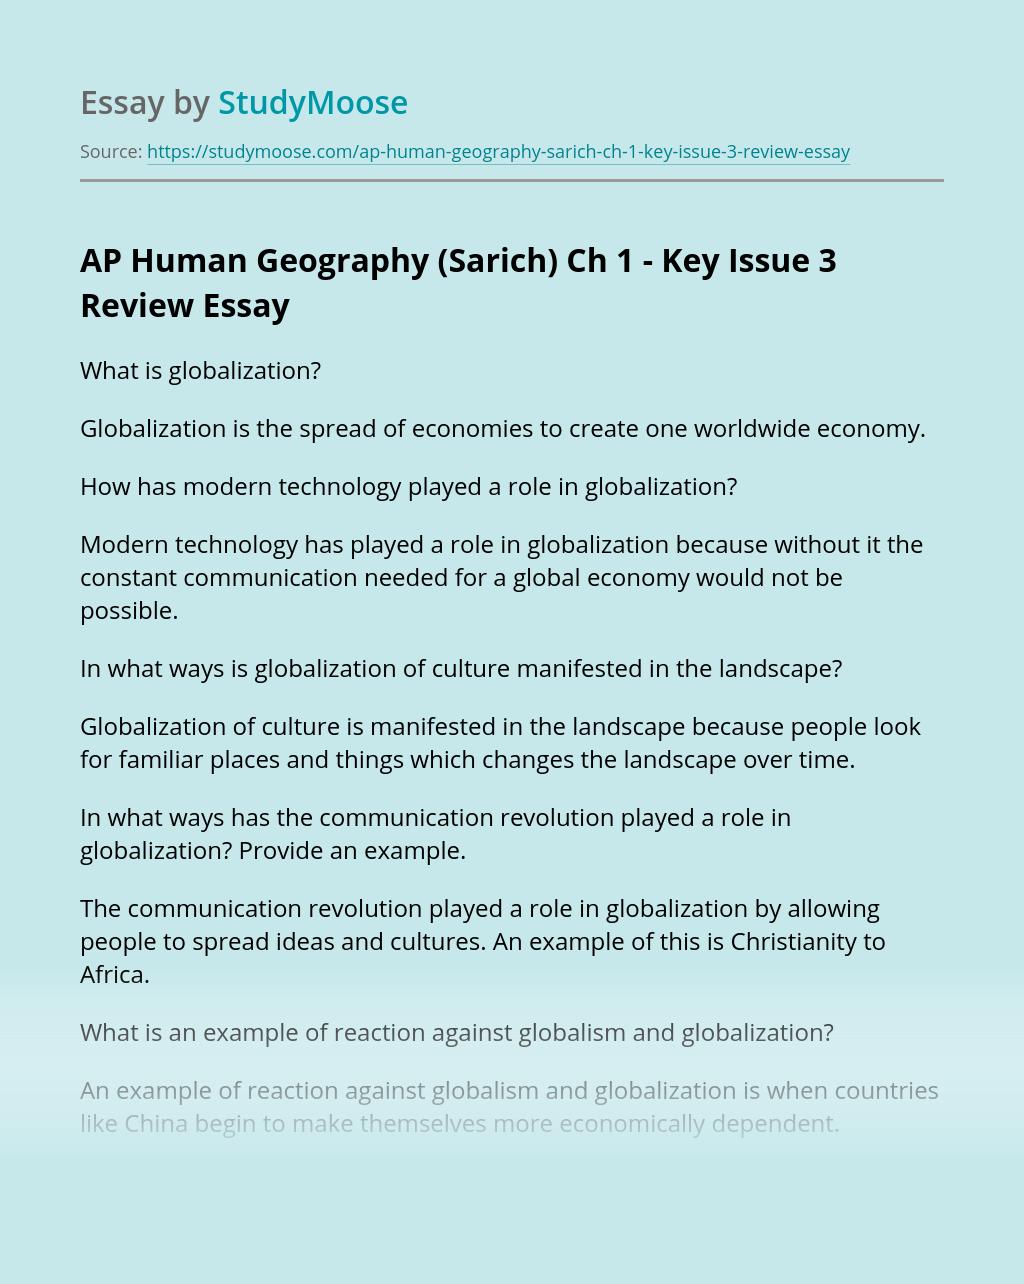 AP Human Geography (Sarich) Ch 1